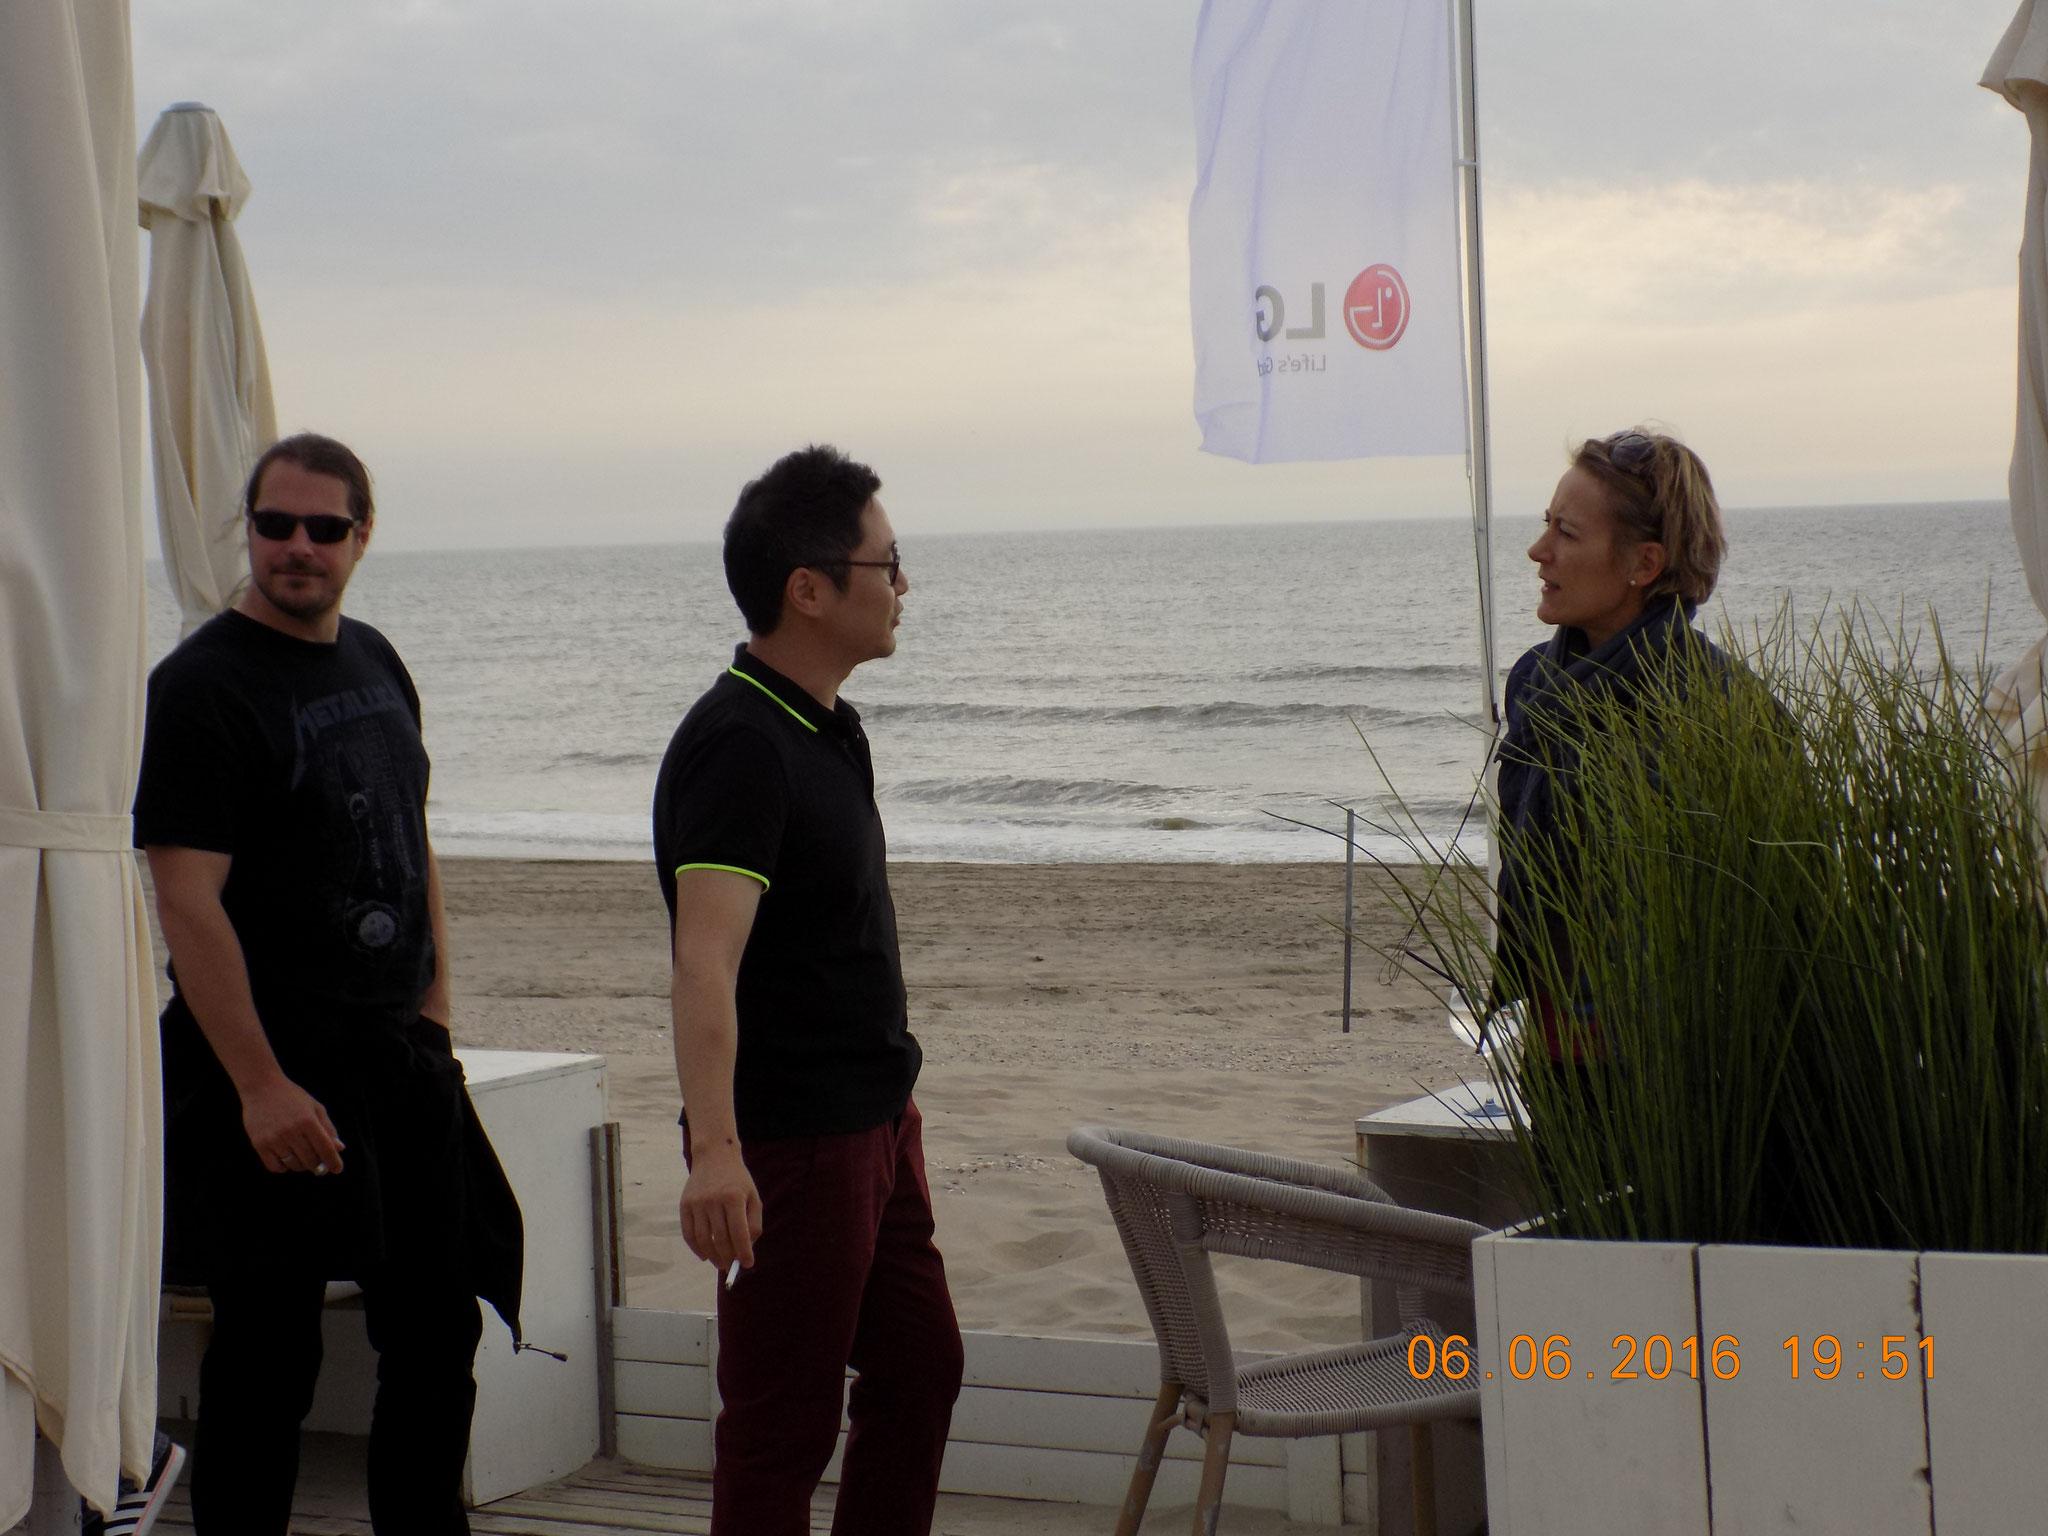 LG Electronics, Distributoren Meeting, Kick-Off, 2015, NL Zanvoort